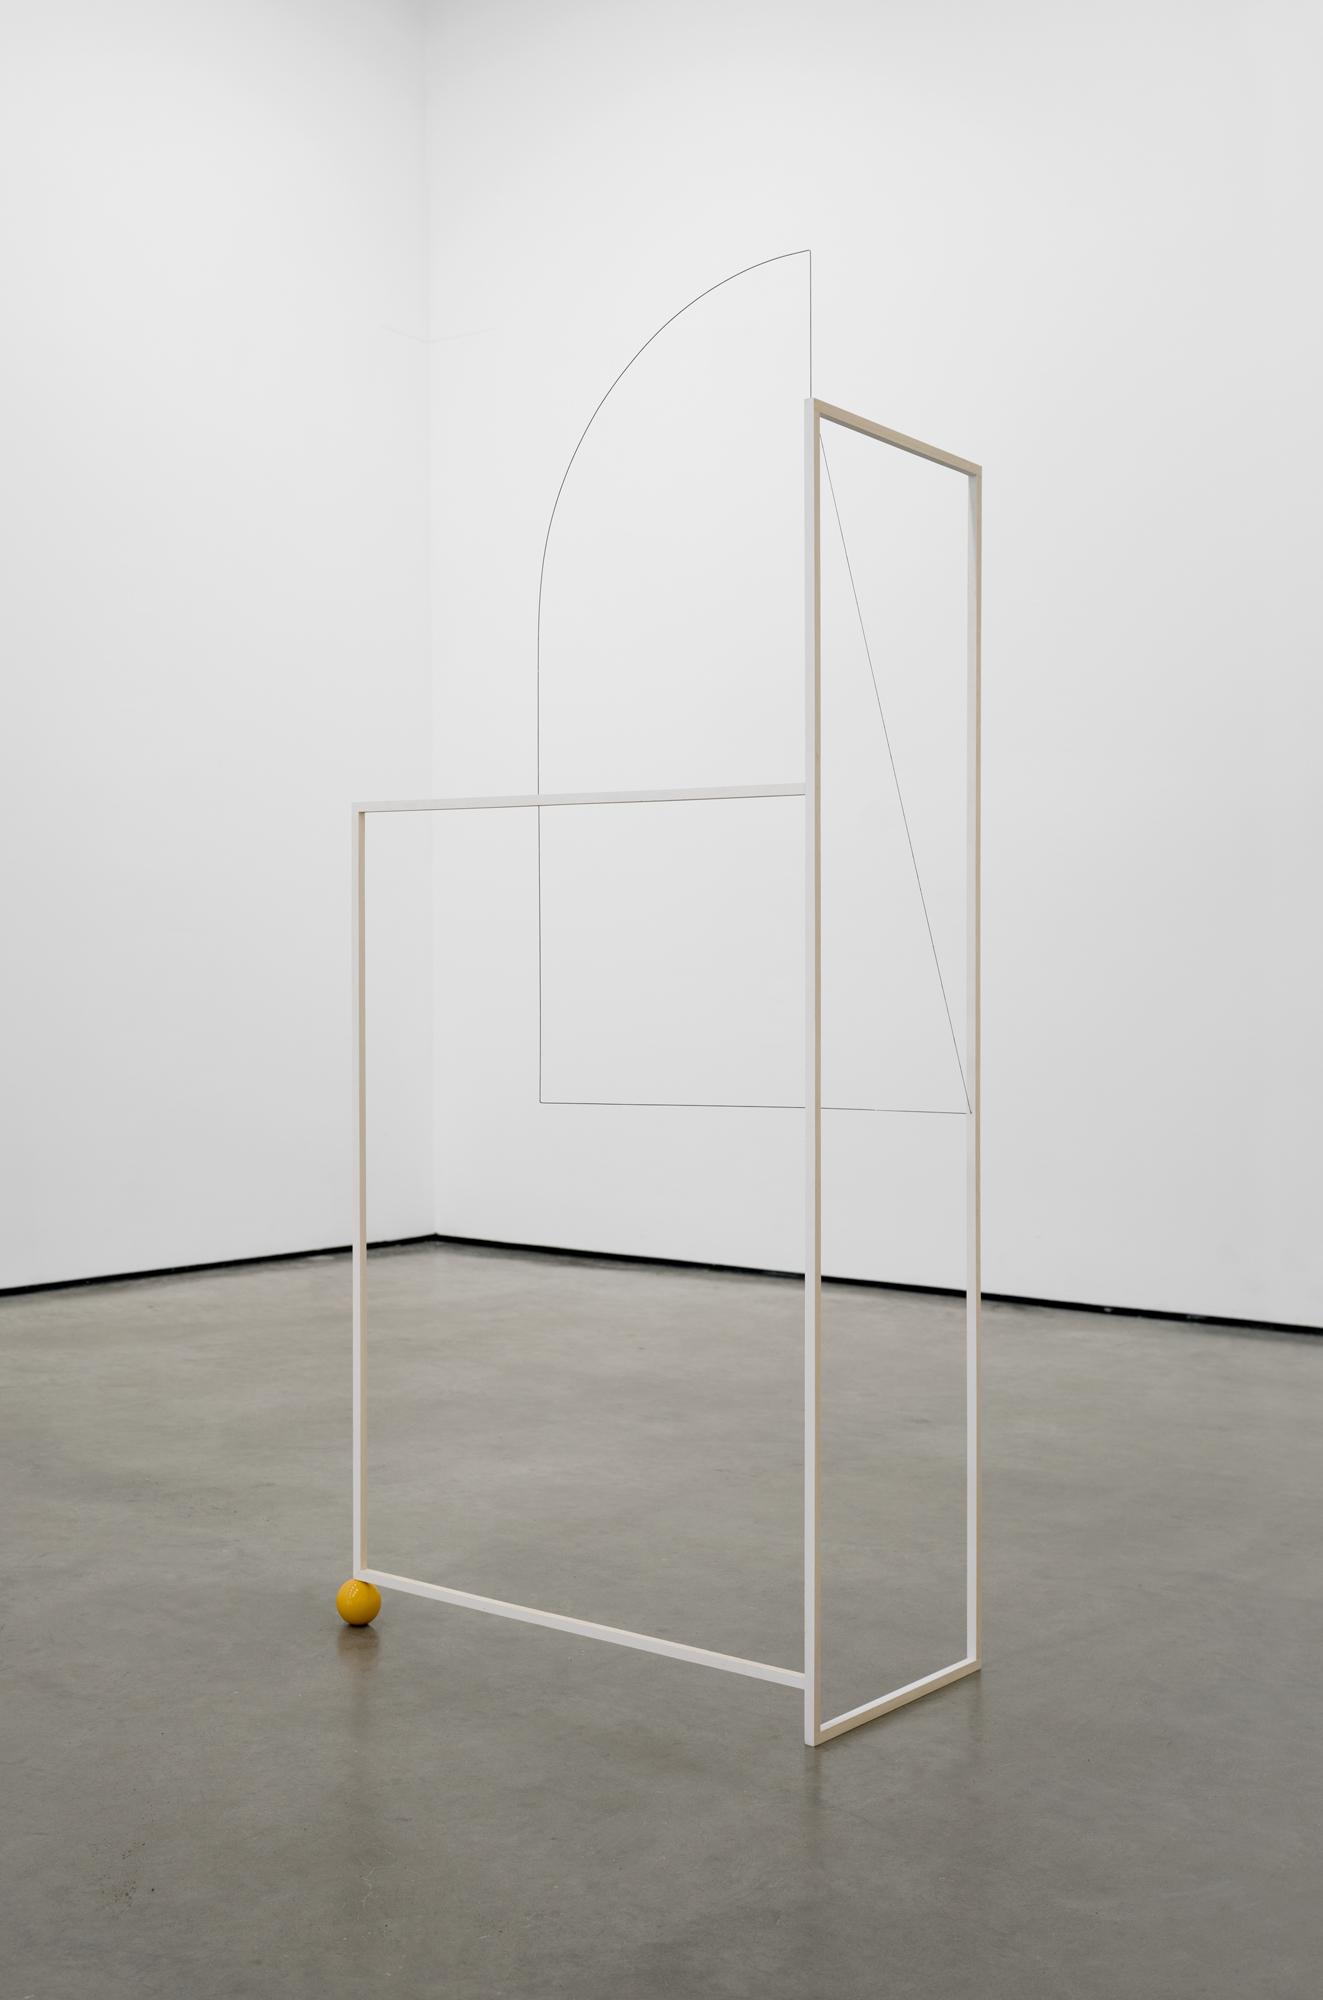 Jong Oh 2021 Wood, paint, metal rod, string, billiard ball. 59.5 x 25.5 x 14 in. 2021 Marc Straus Gallery